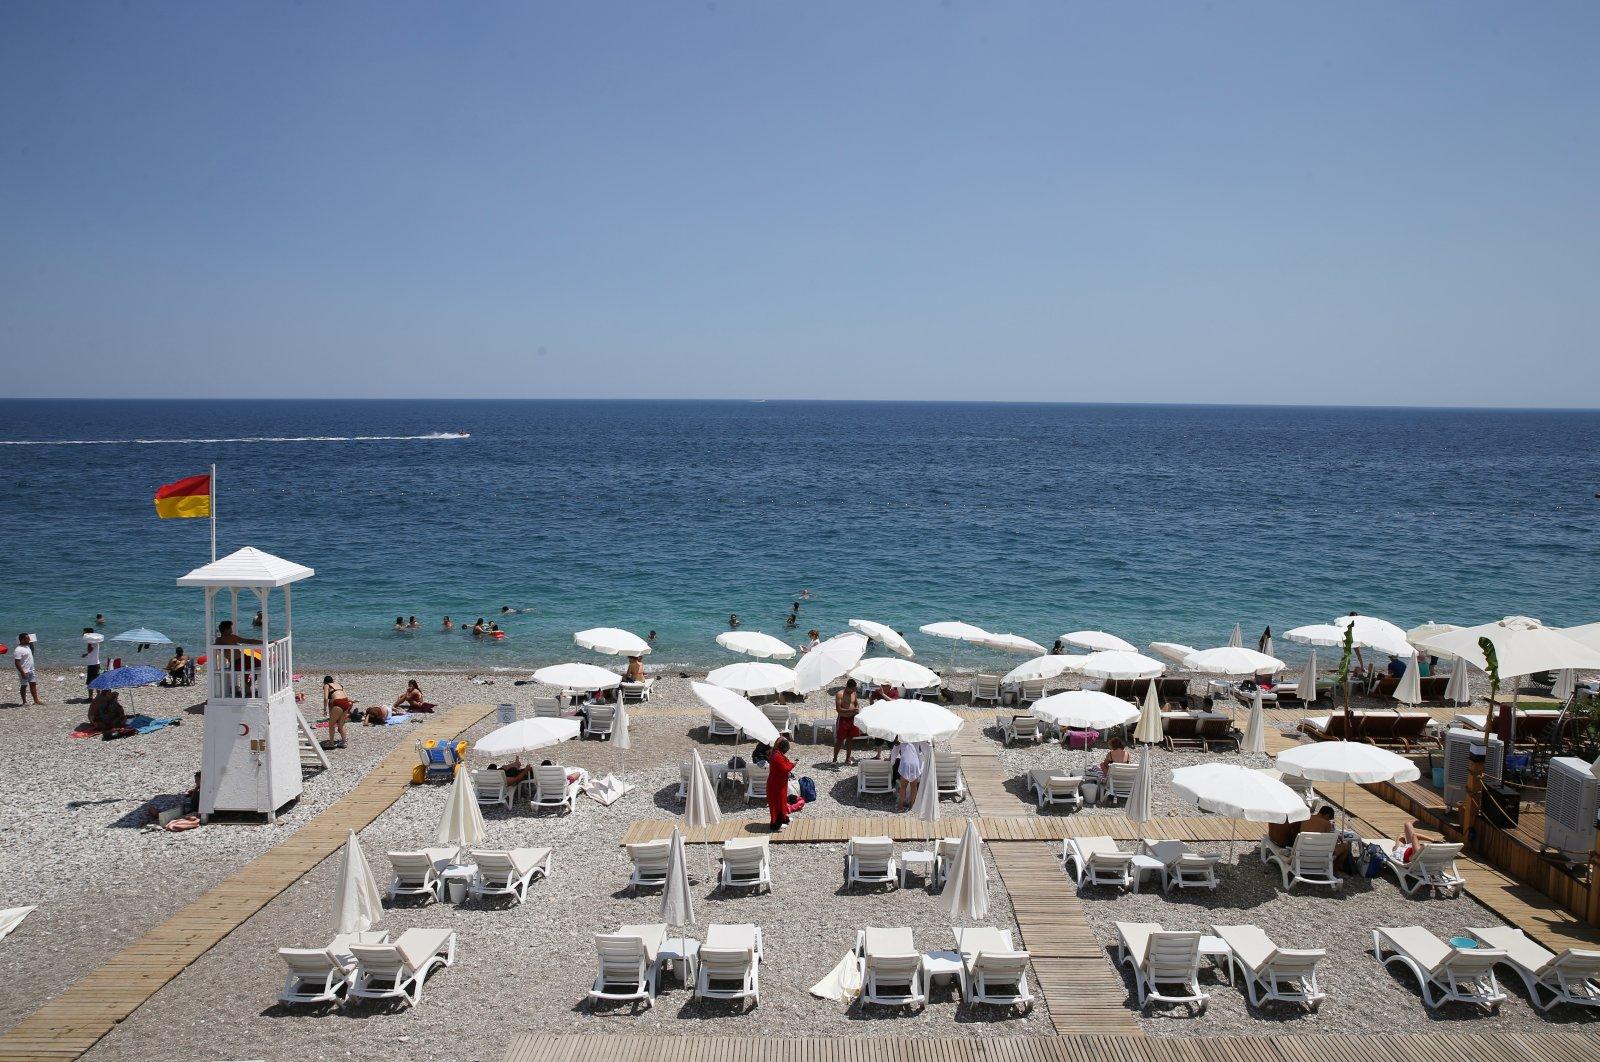 People enjoy the hot weather at Konyaaltı beach, Antalya, southern Turkey, June 28, 2021. (AA Photo)